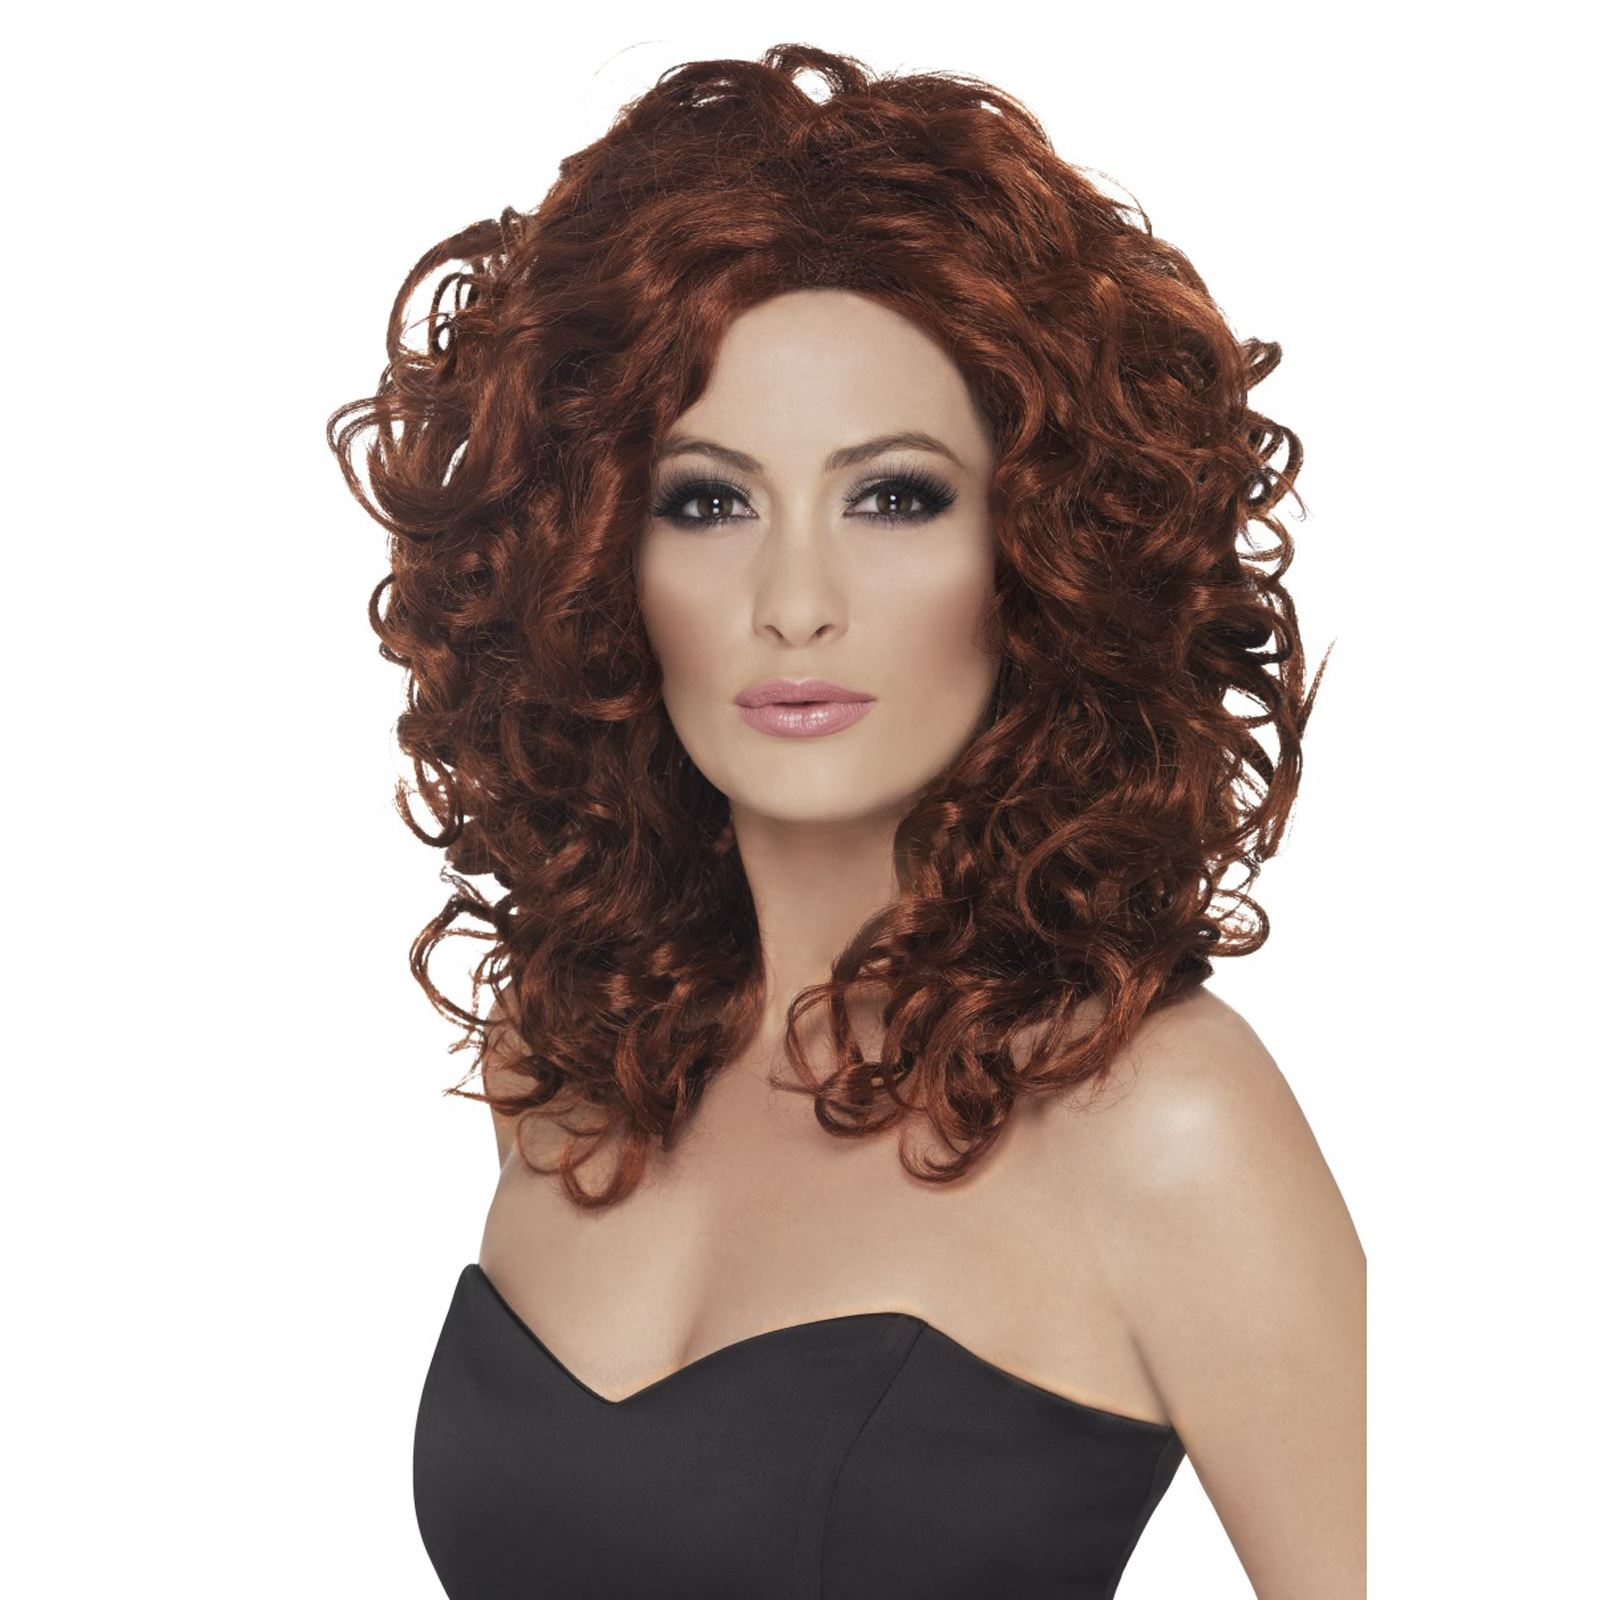 Adult Ladies Pop Star Celebrity Auburn Brown Curly Wig Fancy Dress Accessory